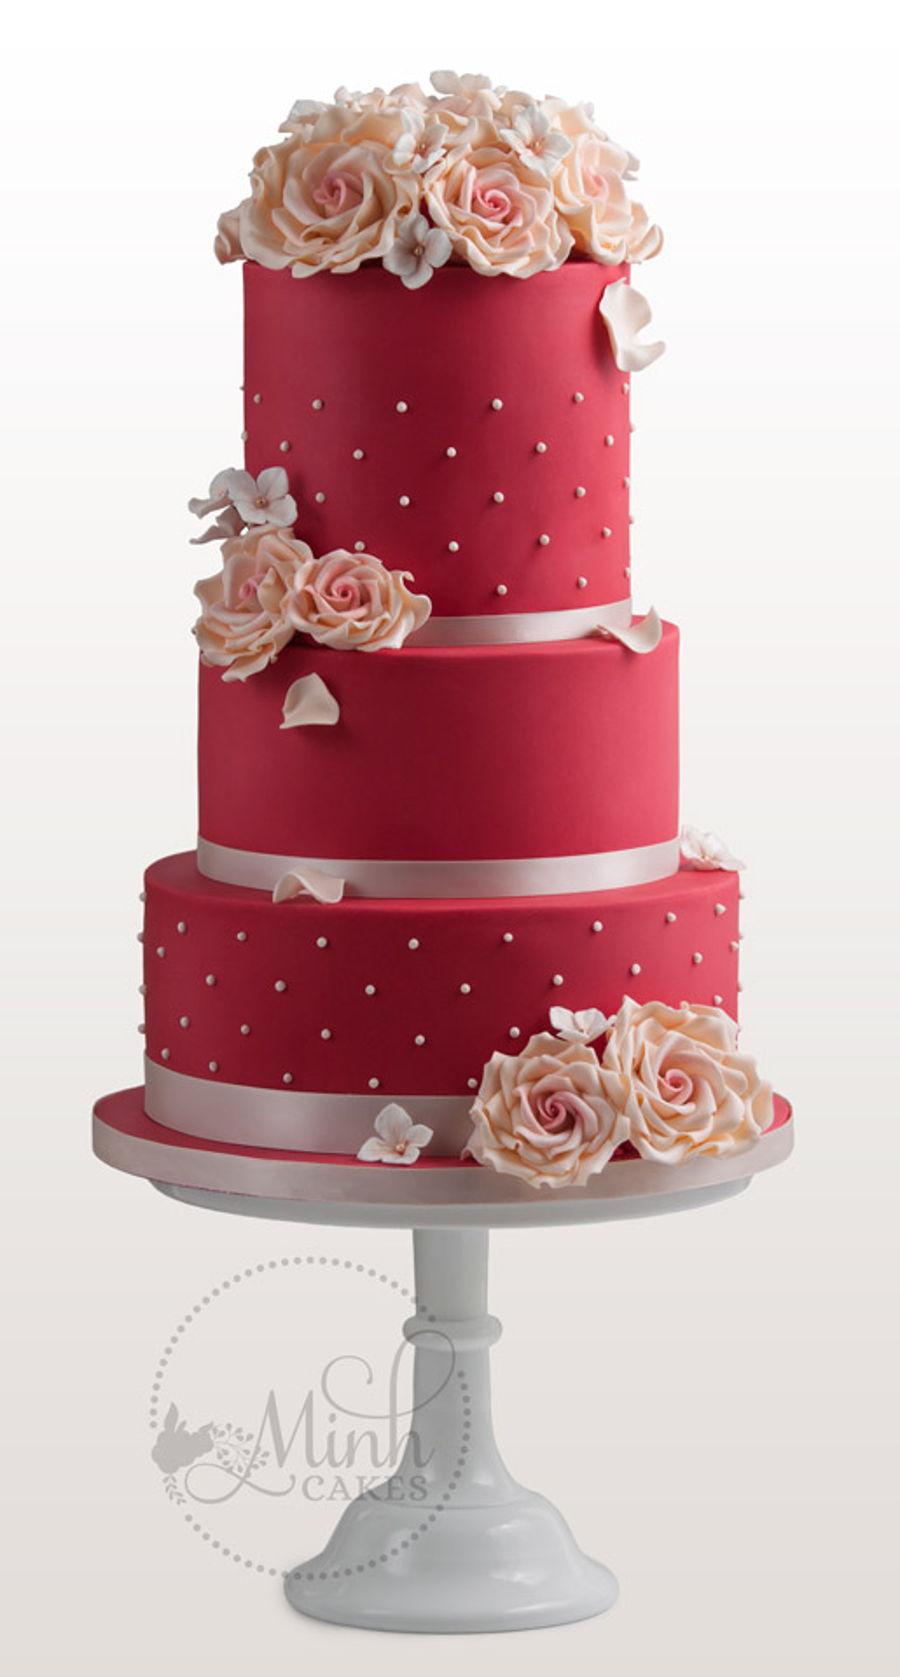 Ruby Wedding Cakes Designs